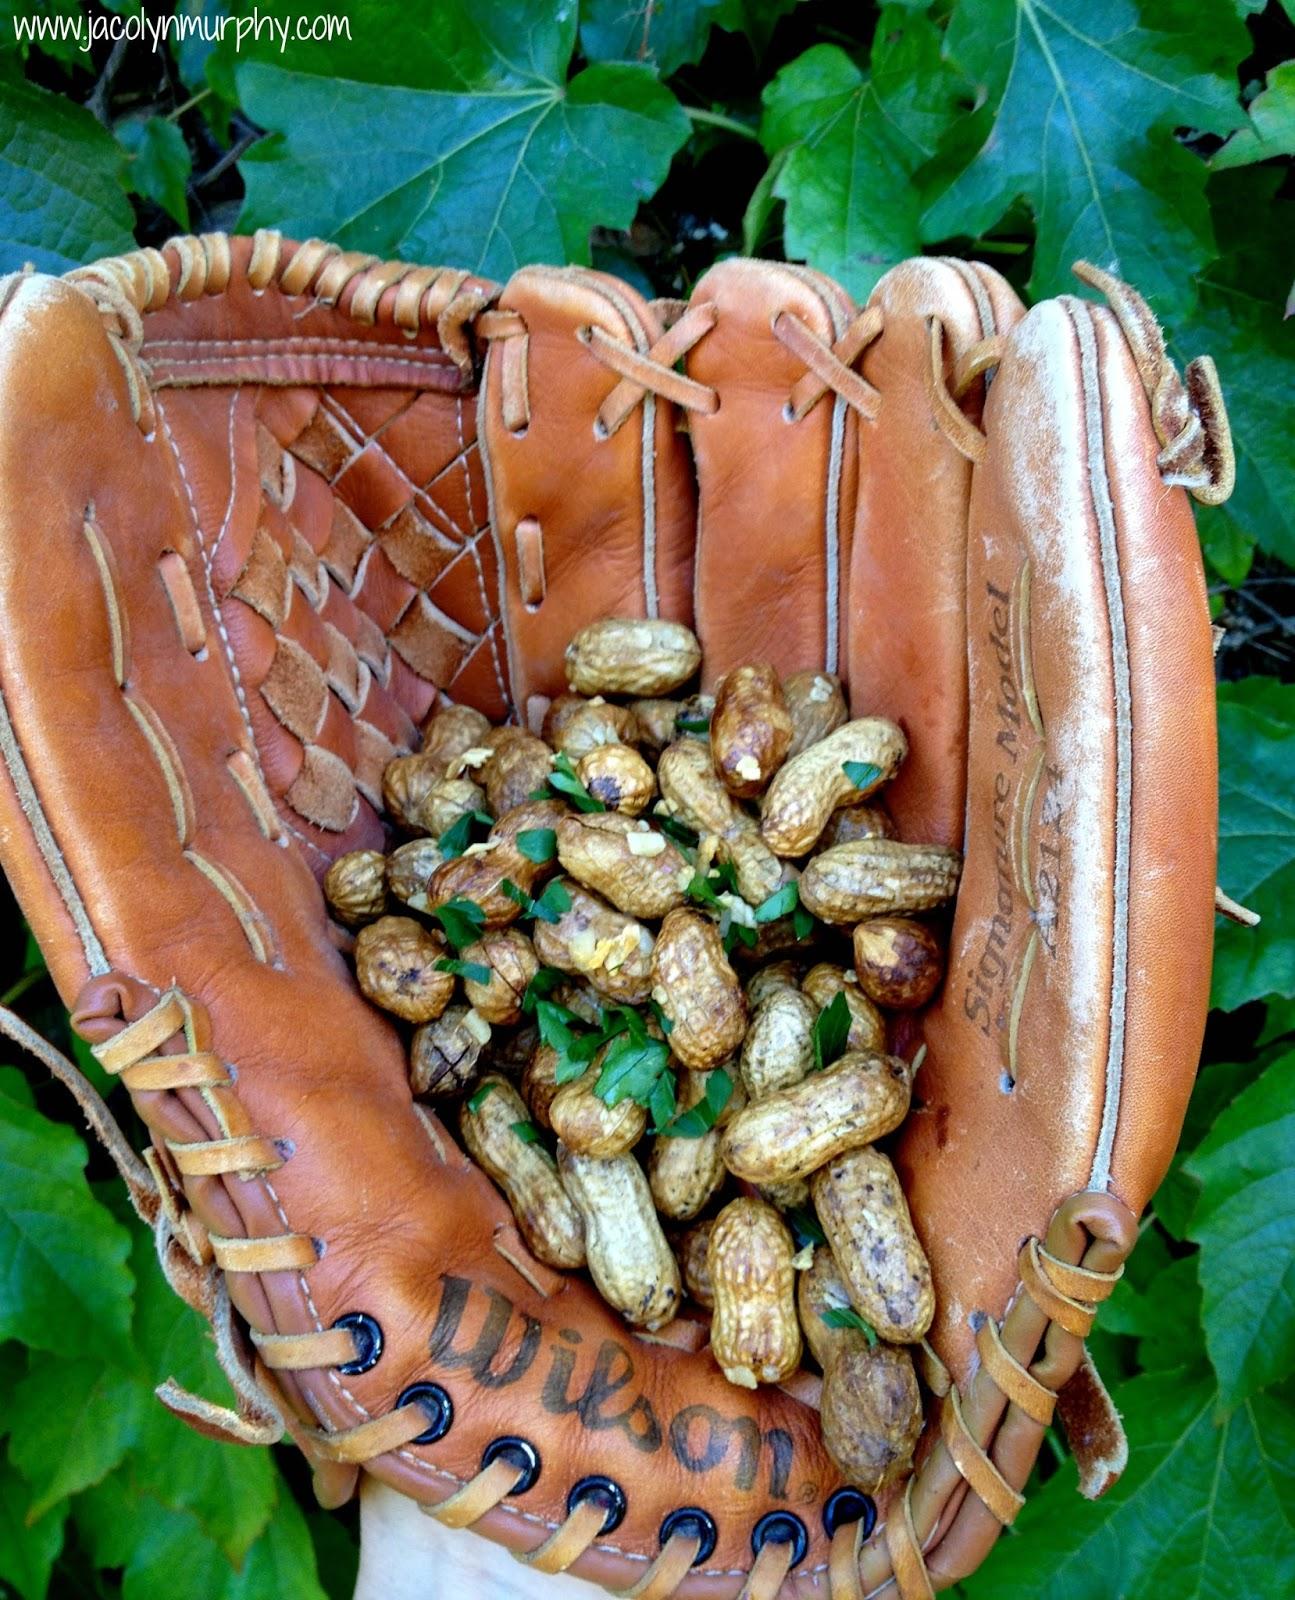 Garlic Roasted Peanuts